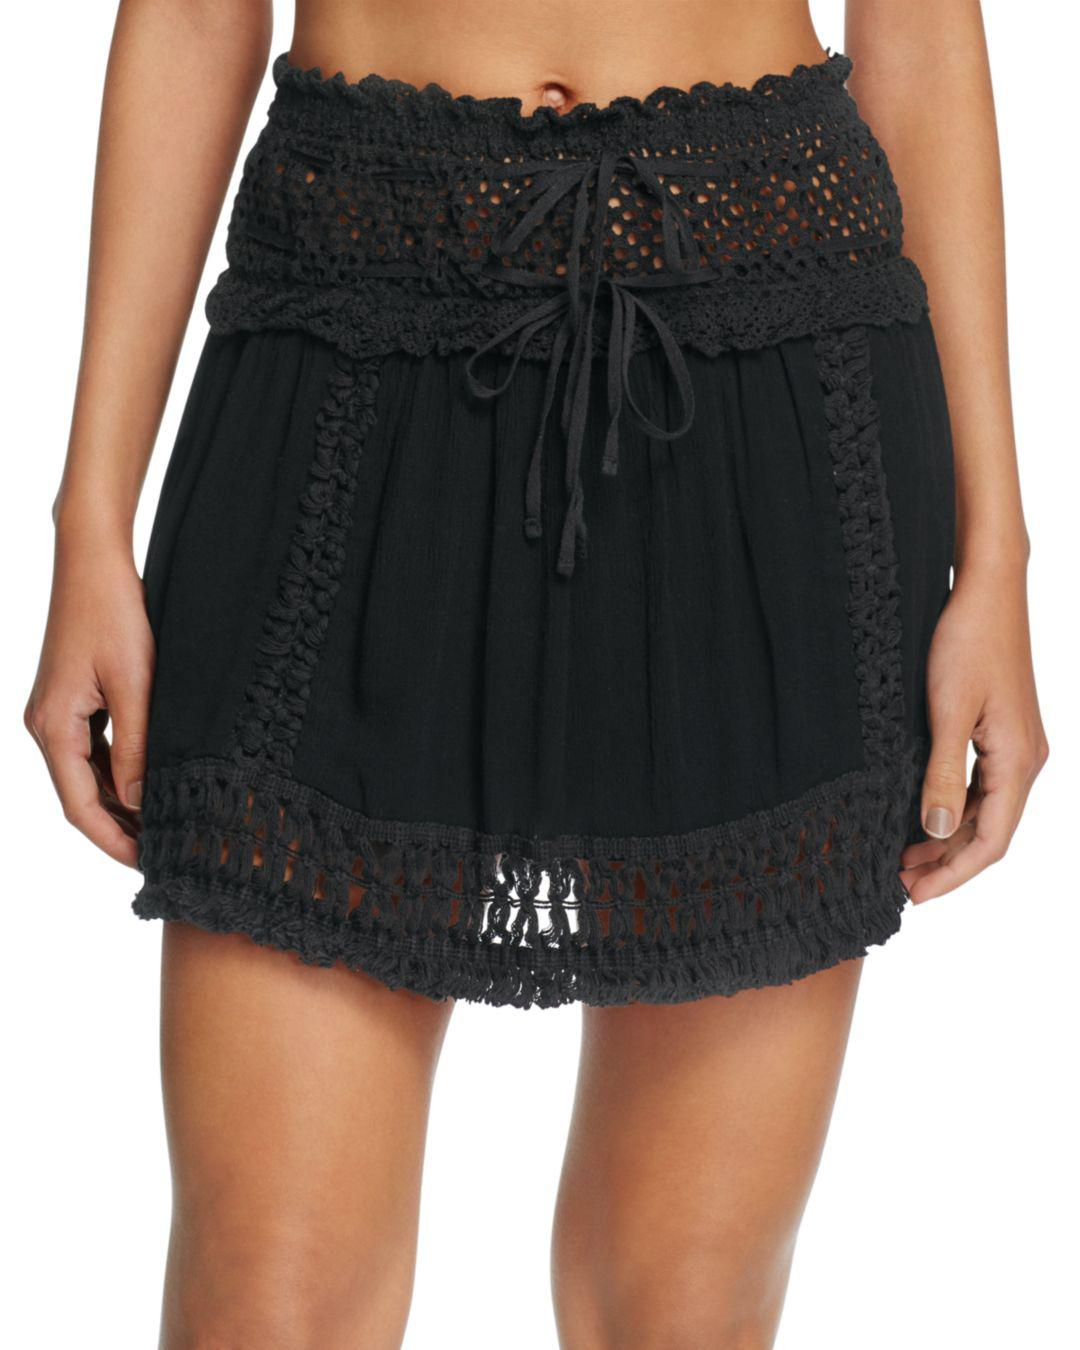 5f965cae82ada Lyst - Surf Gypsy Crochet Fringe Mini Skirt Swim Cover-up in Black